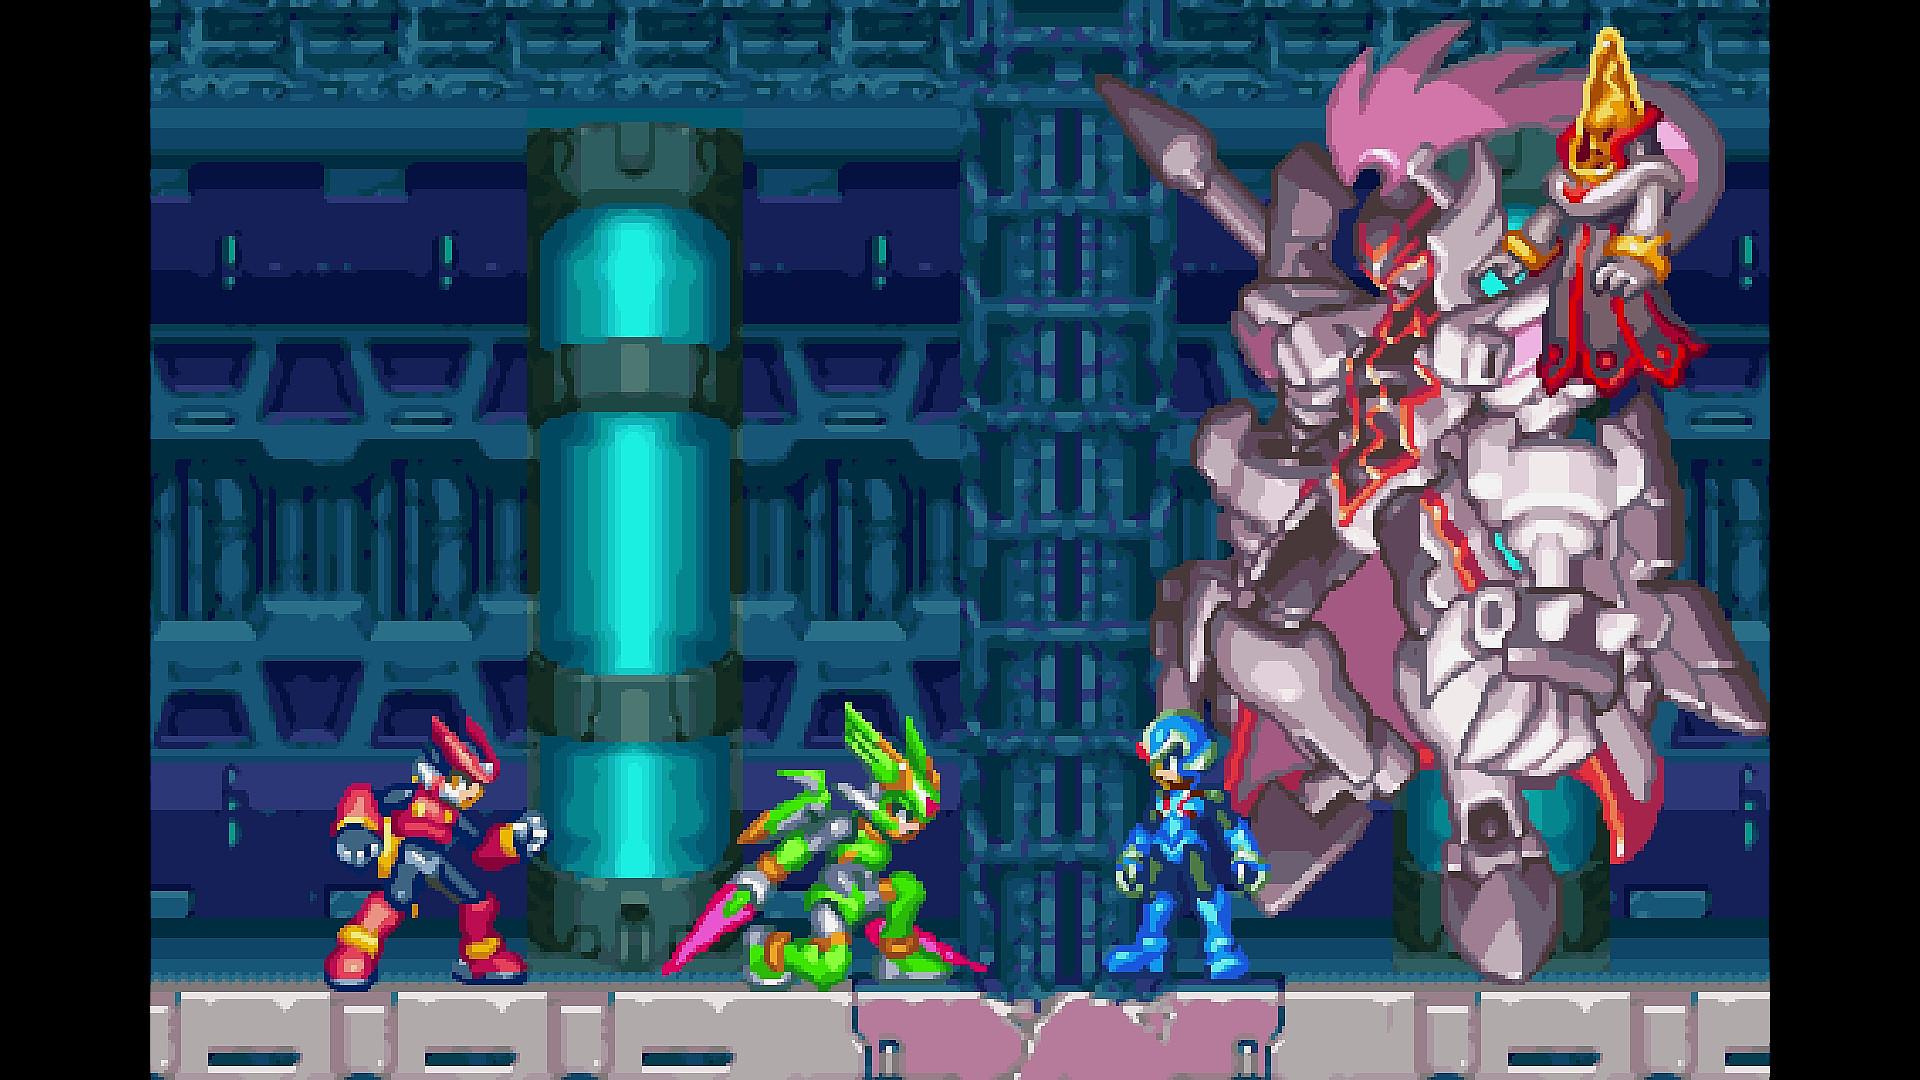 洛克人Zero/ZX遗产合集/Mega Man Zero/ZX Legacy Collection插图1